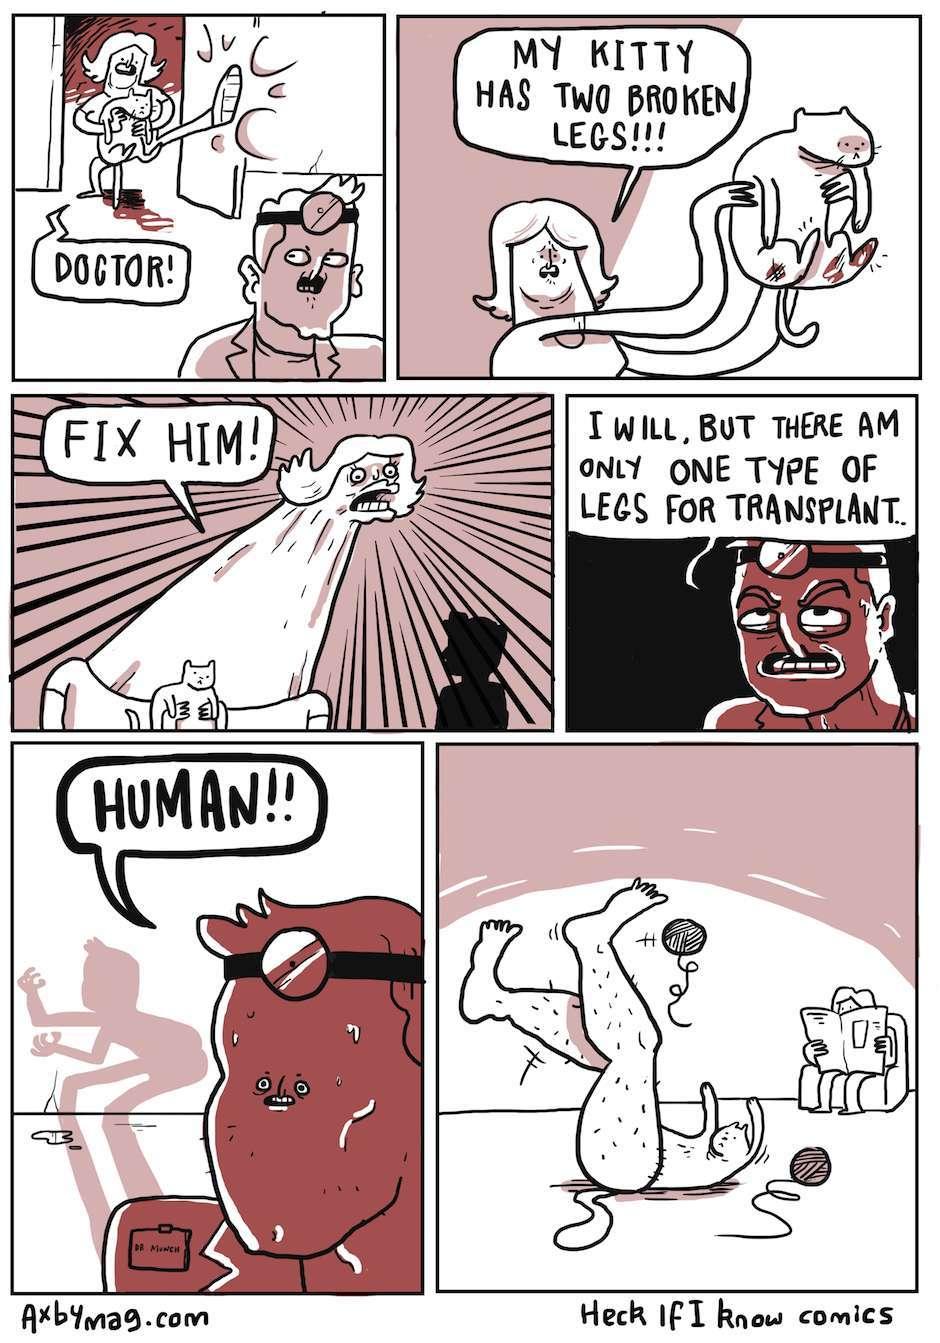 those unshaven human legs - meme